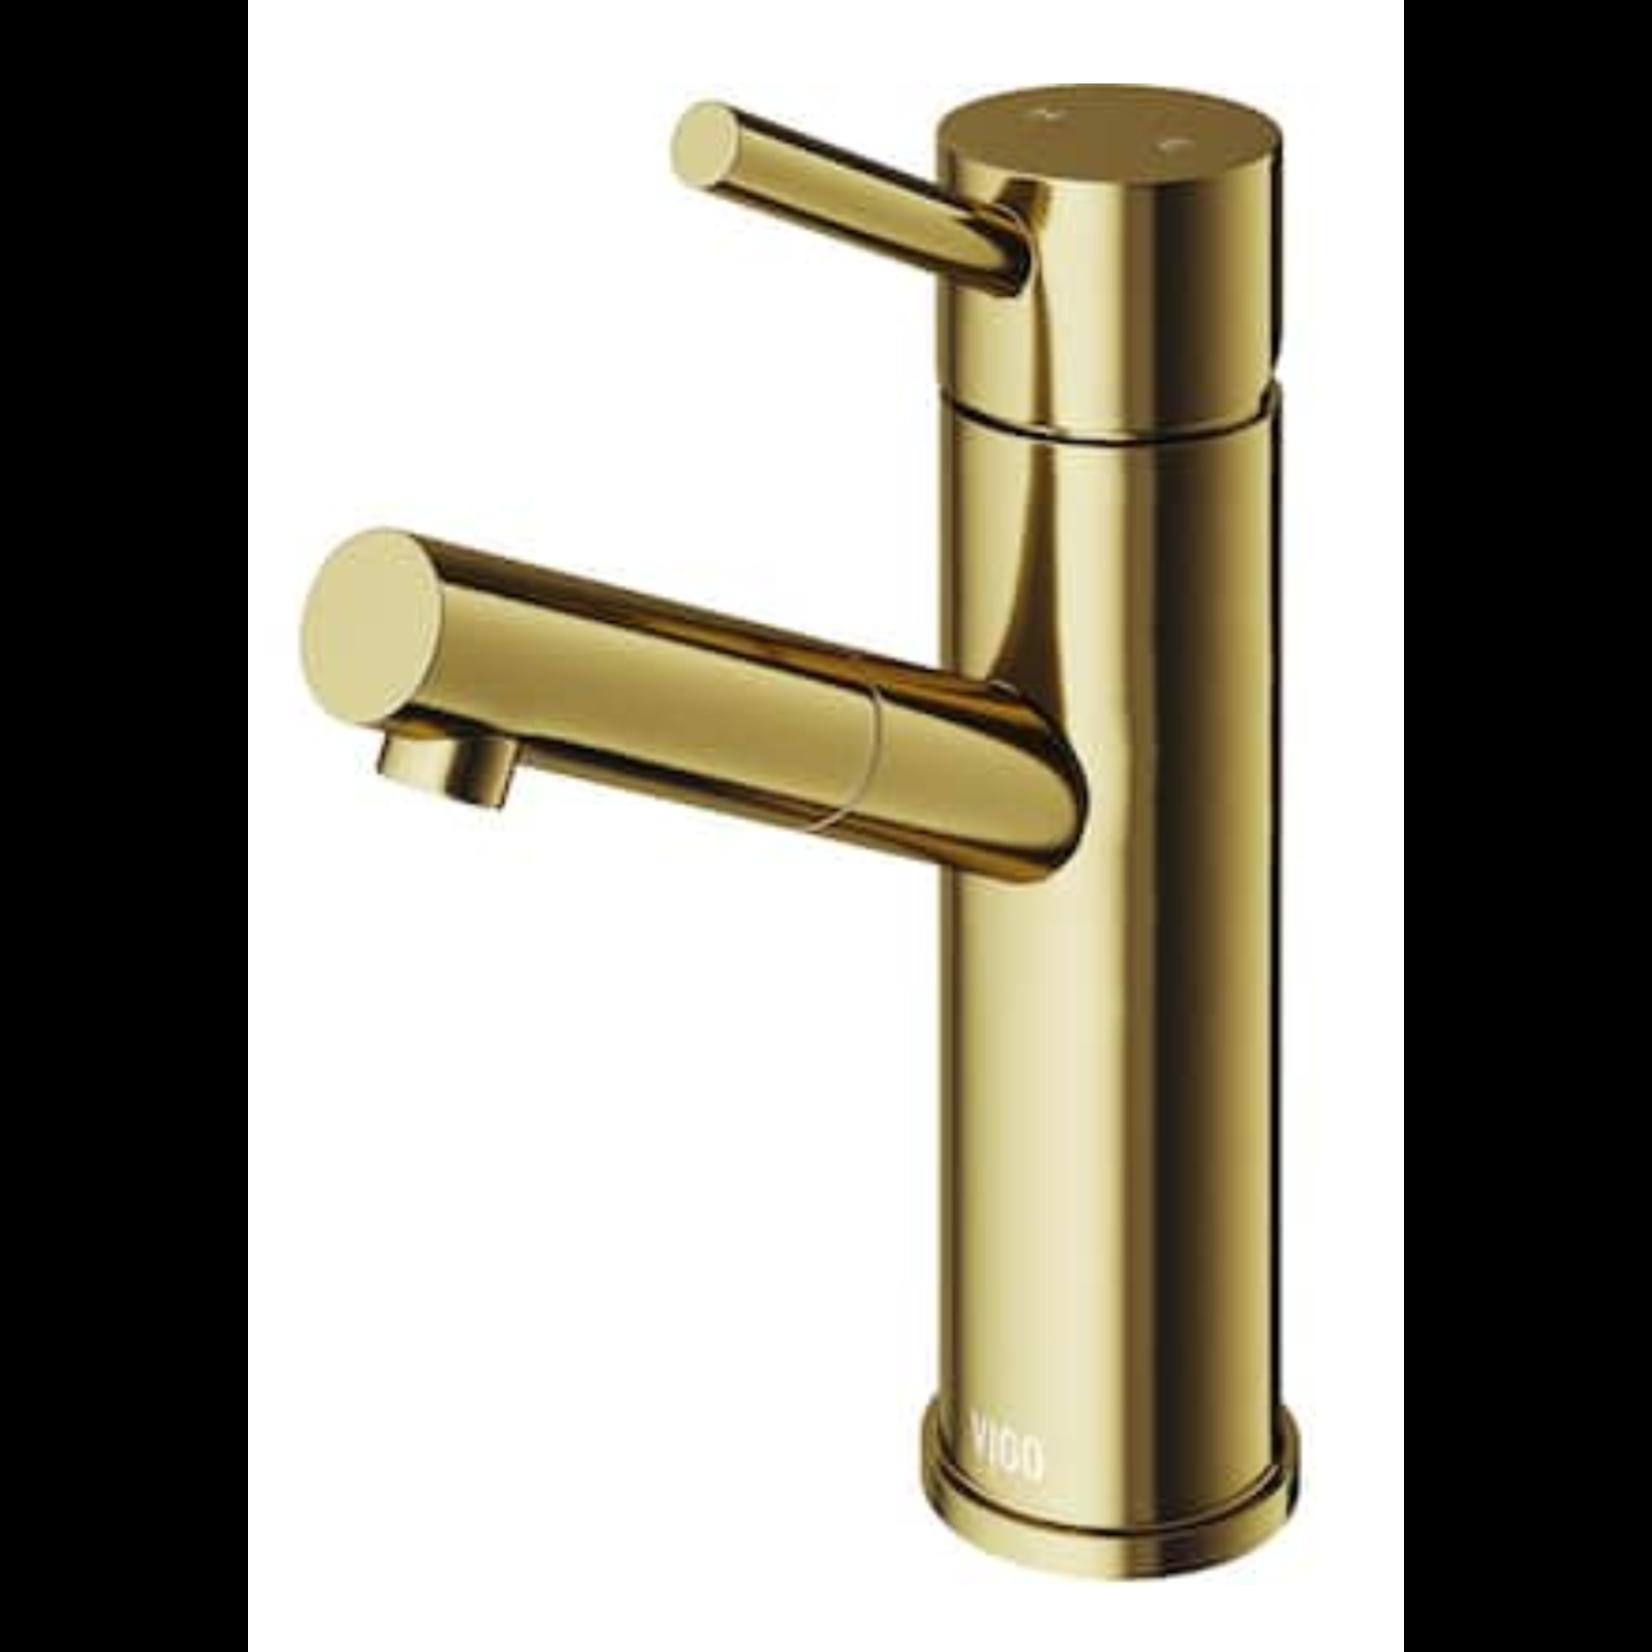 10506 VIGO Nomas Matte Gold 1-Handle Single Hole Bathroom Sink Faucet